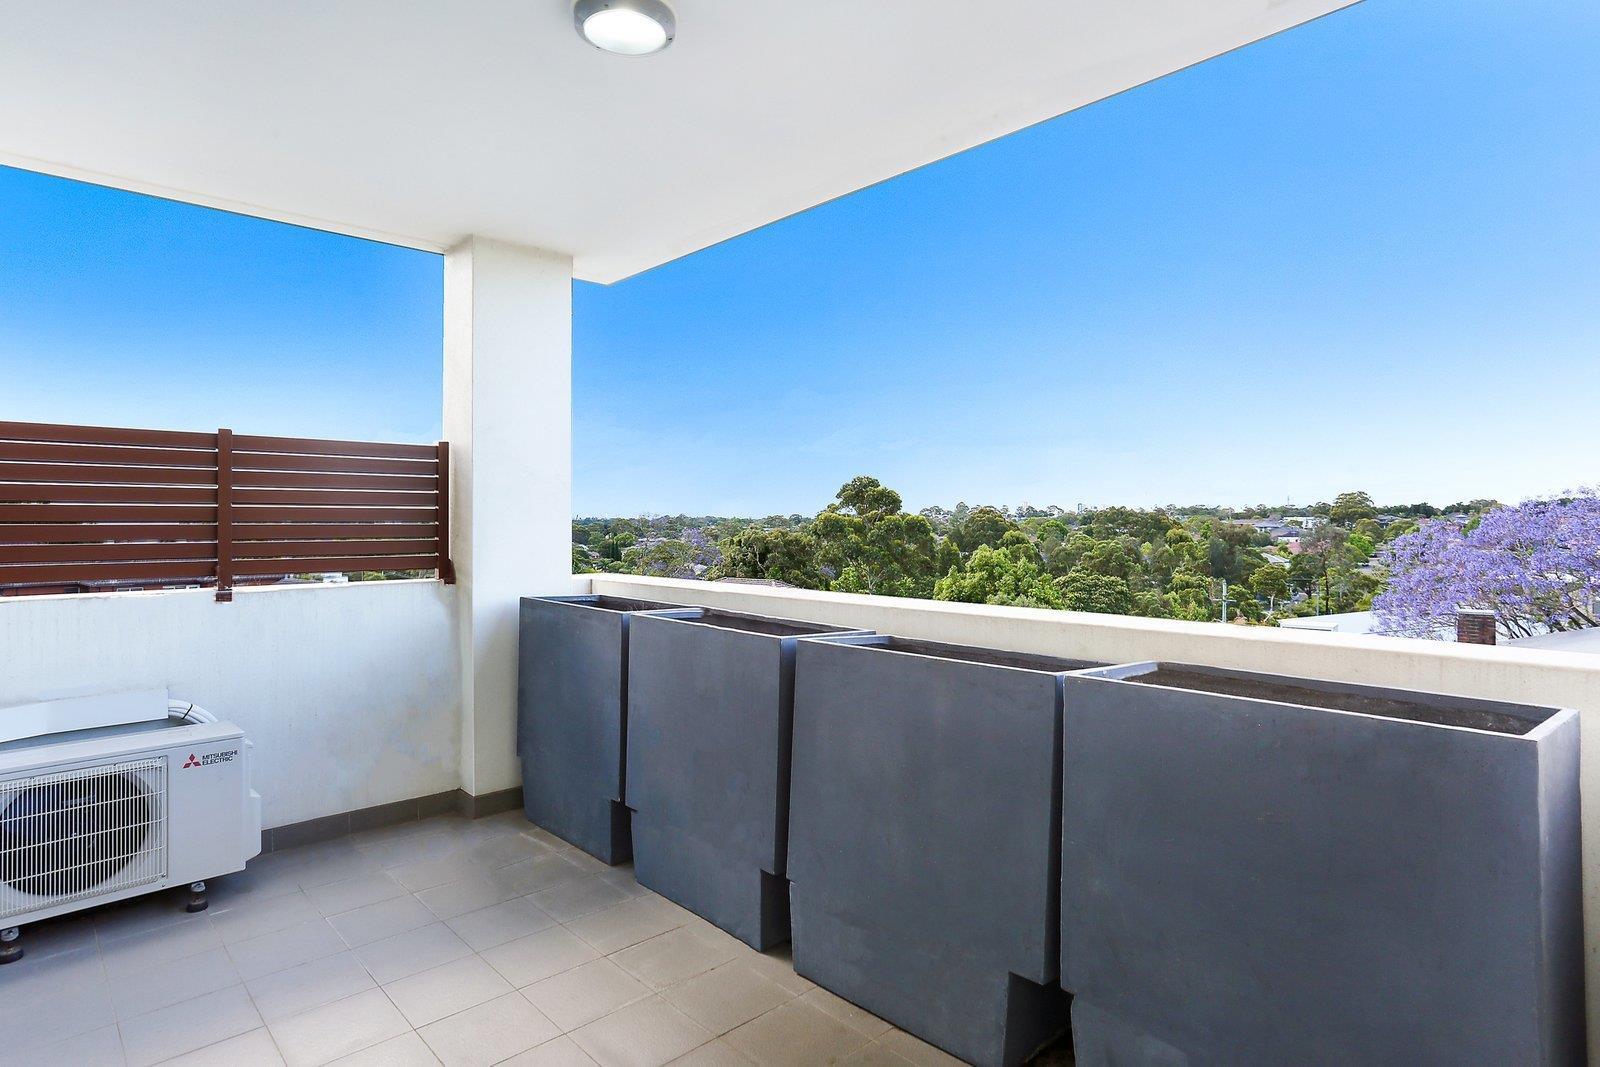 25/235 Homebush Rd, Strathfield, NSW 2135